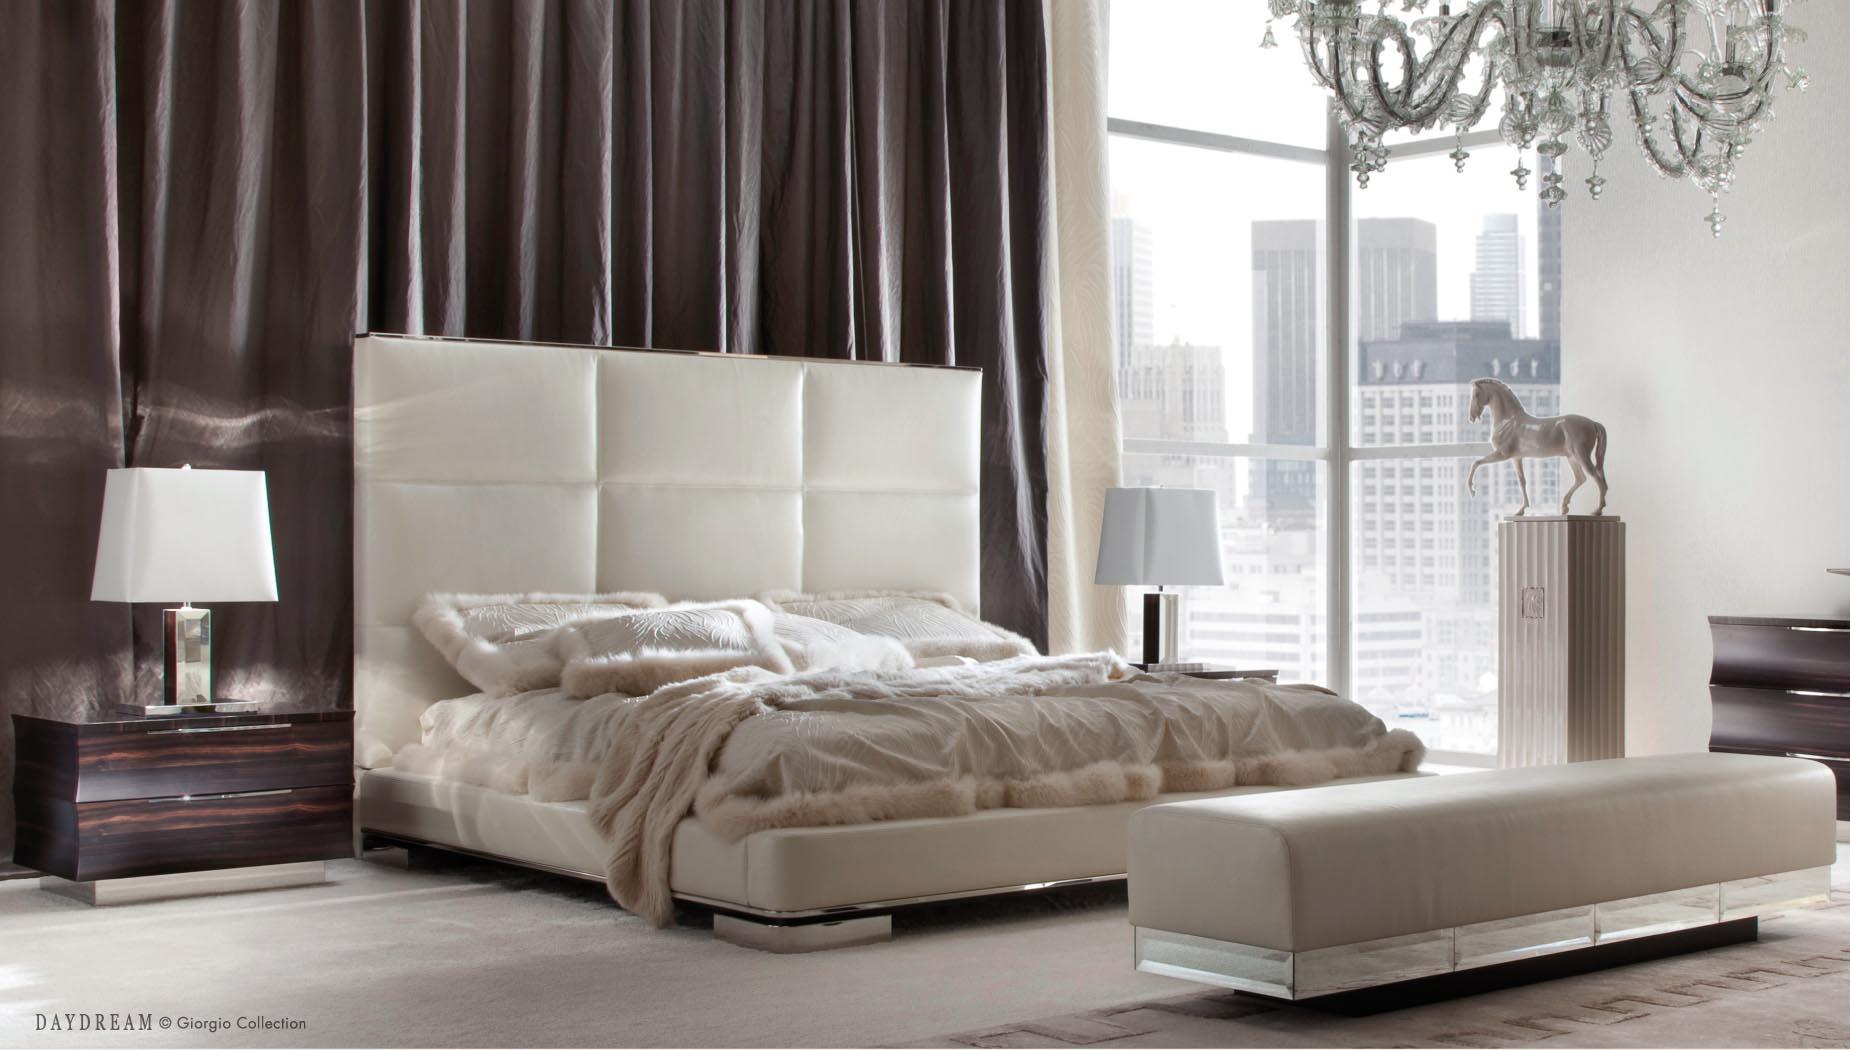 Daydream_italian-luxury-bedroom-25